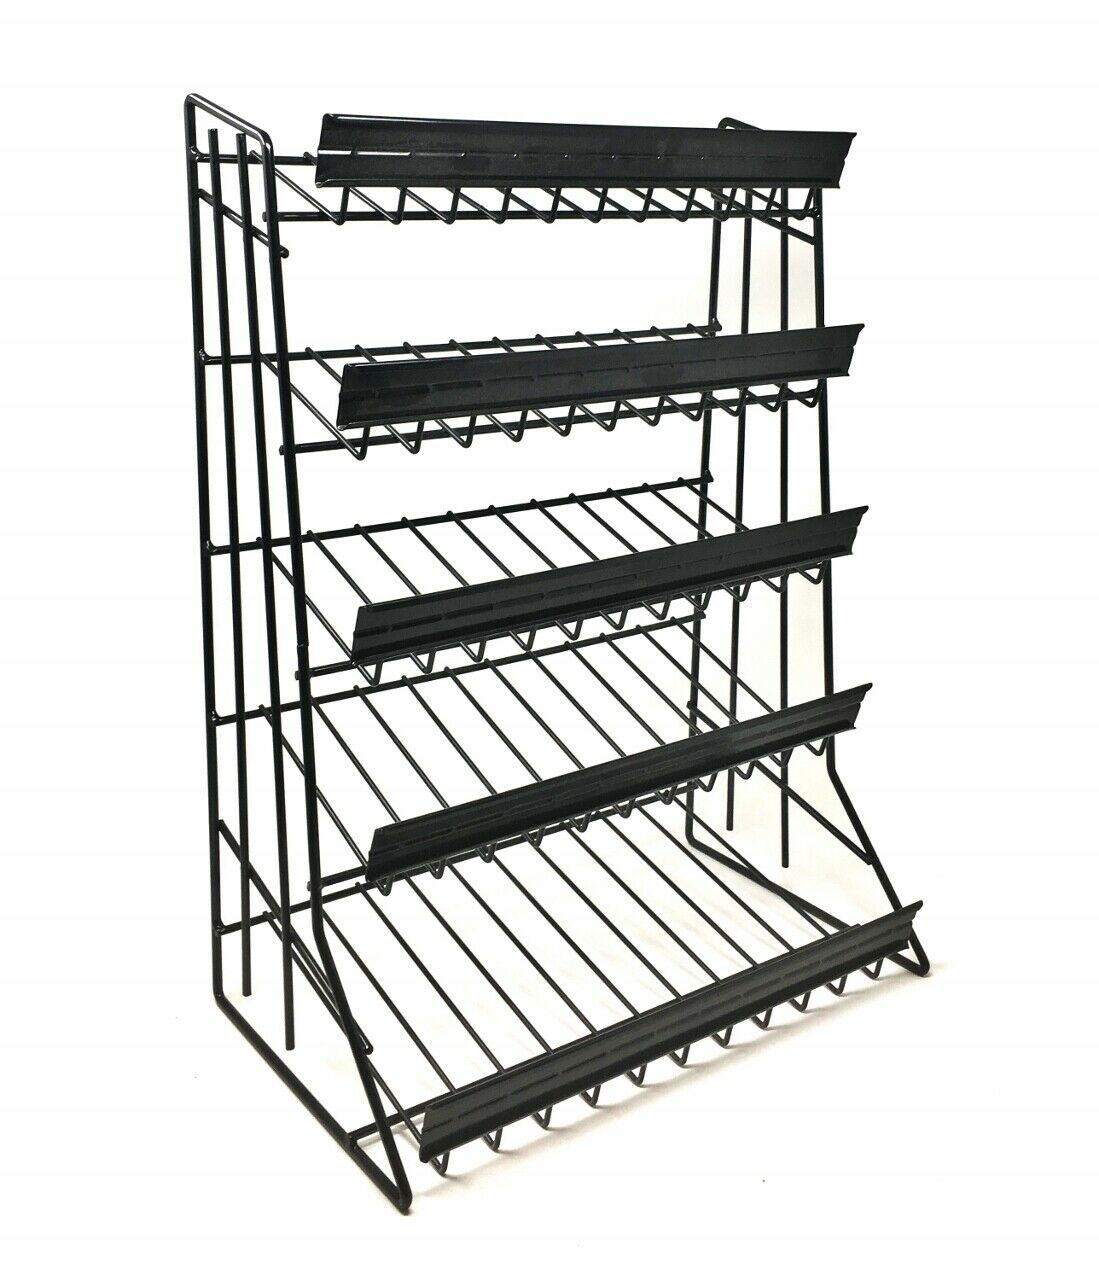 "5 Tier Shelf Counter Top Candy Display Rack - Black "" FREE S"